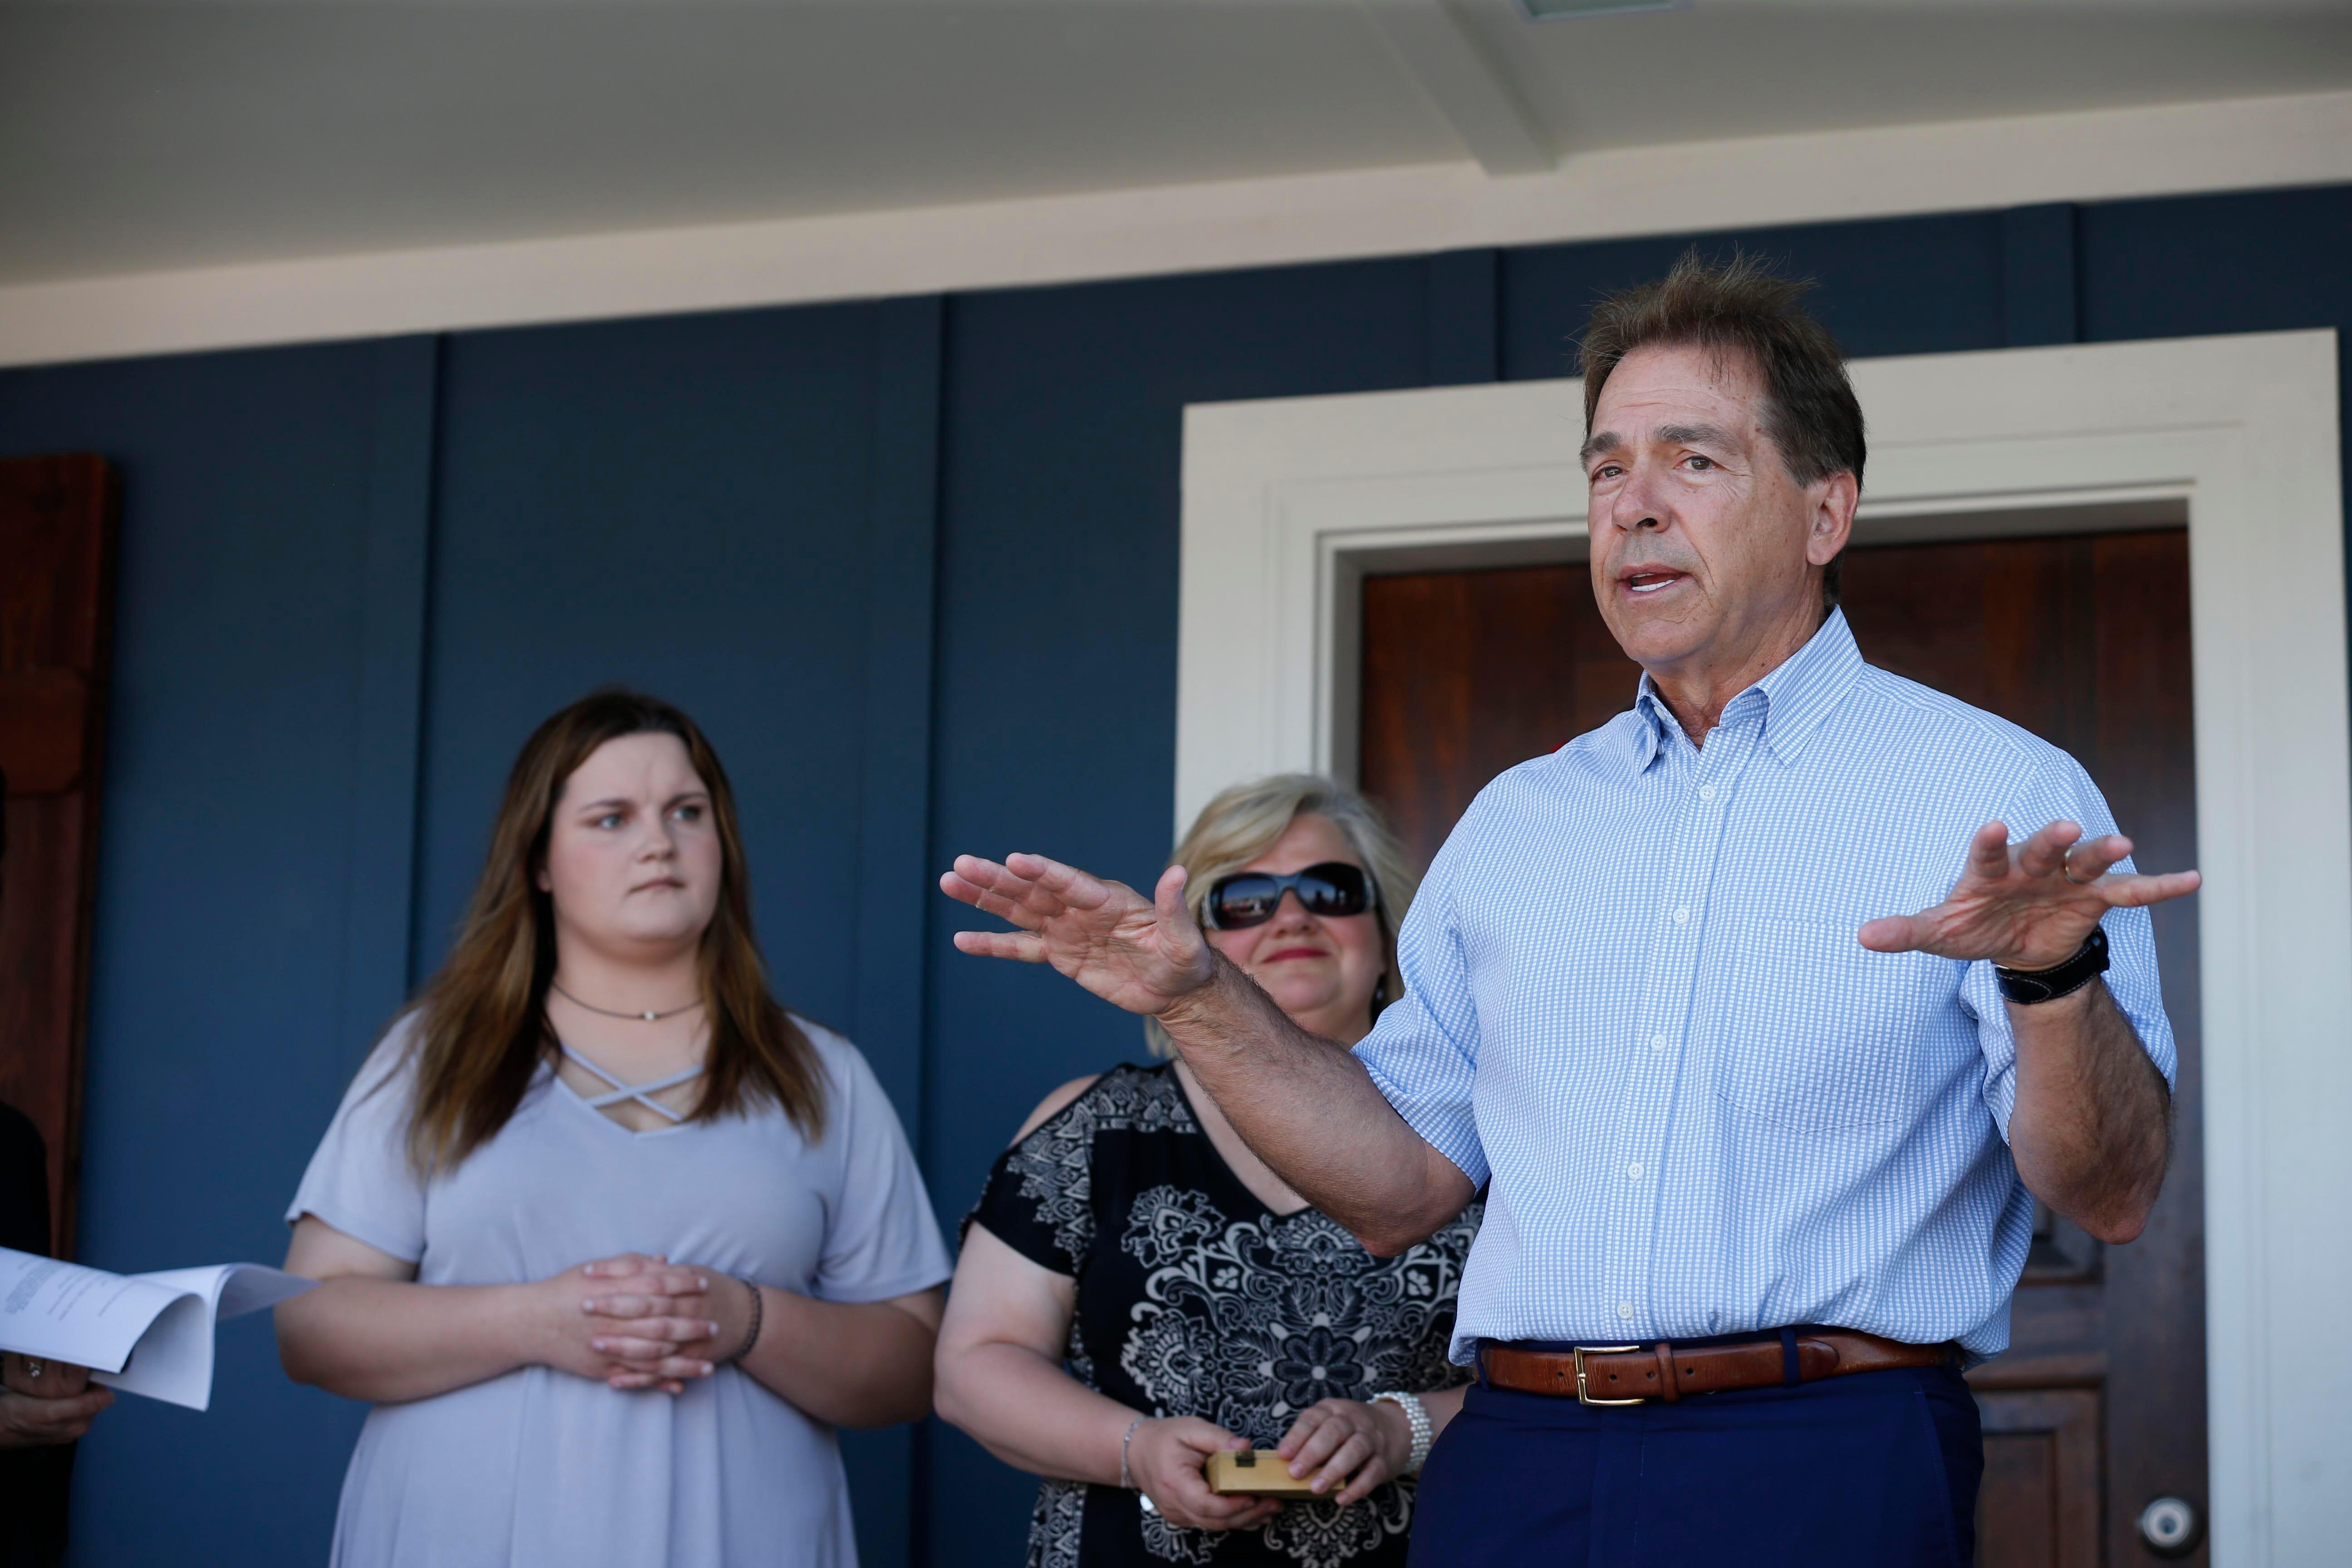 Opinion: Alabama's Nick Saban uses elder statesman status while avoiding political drama